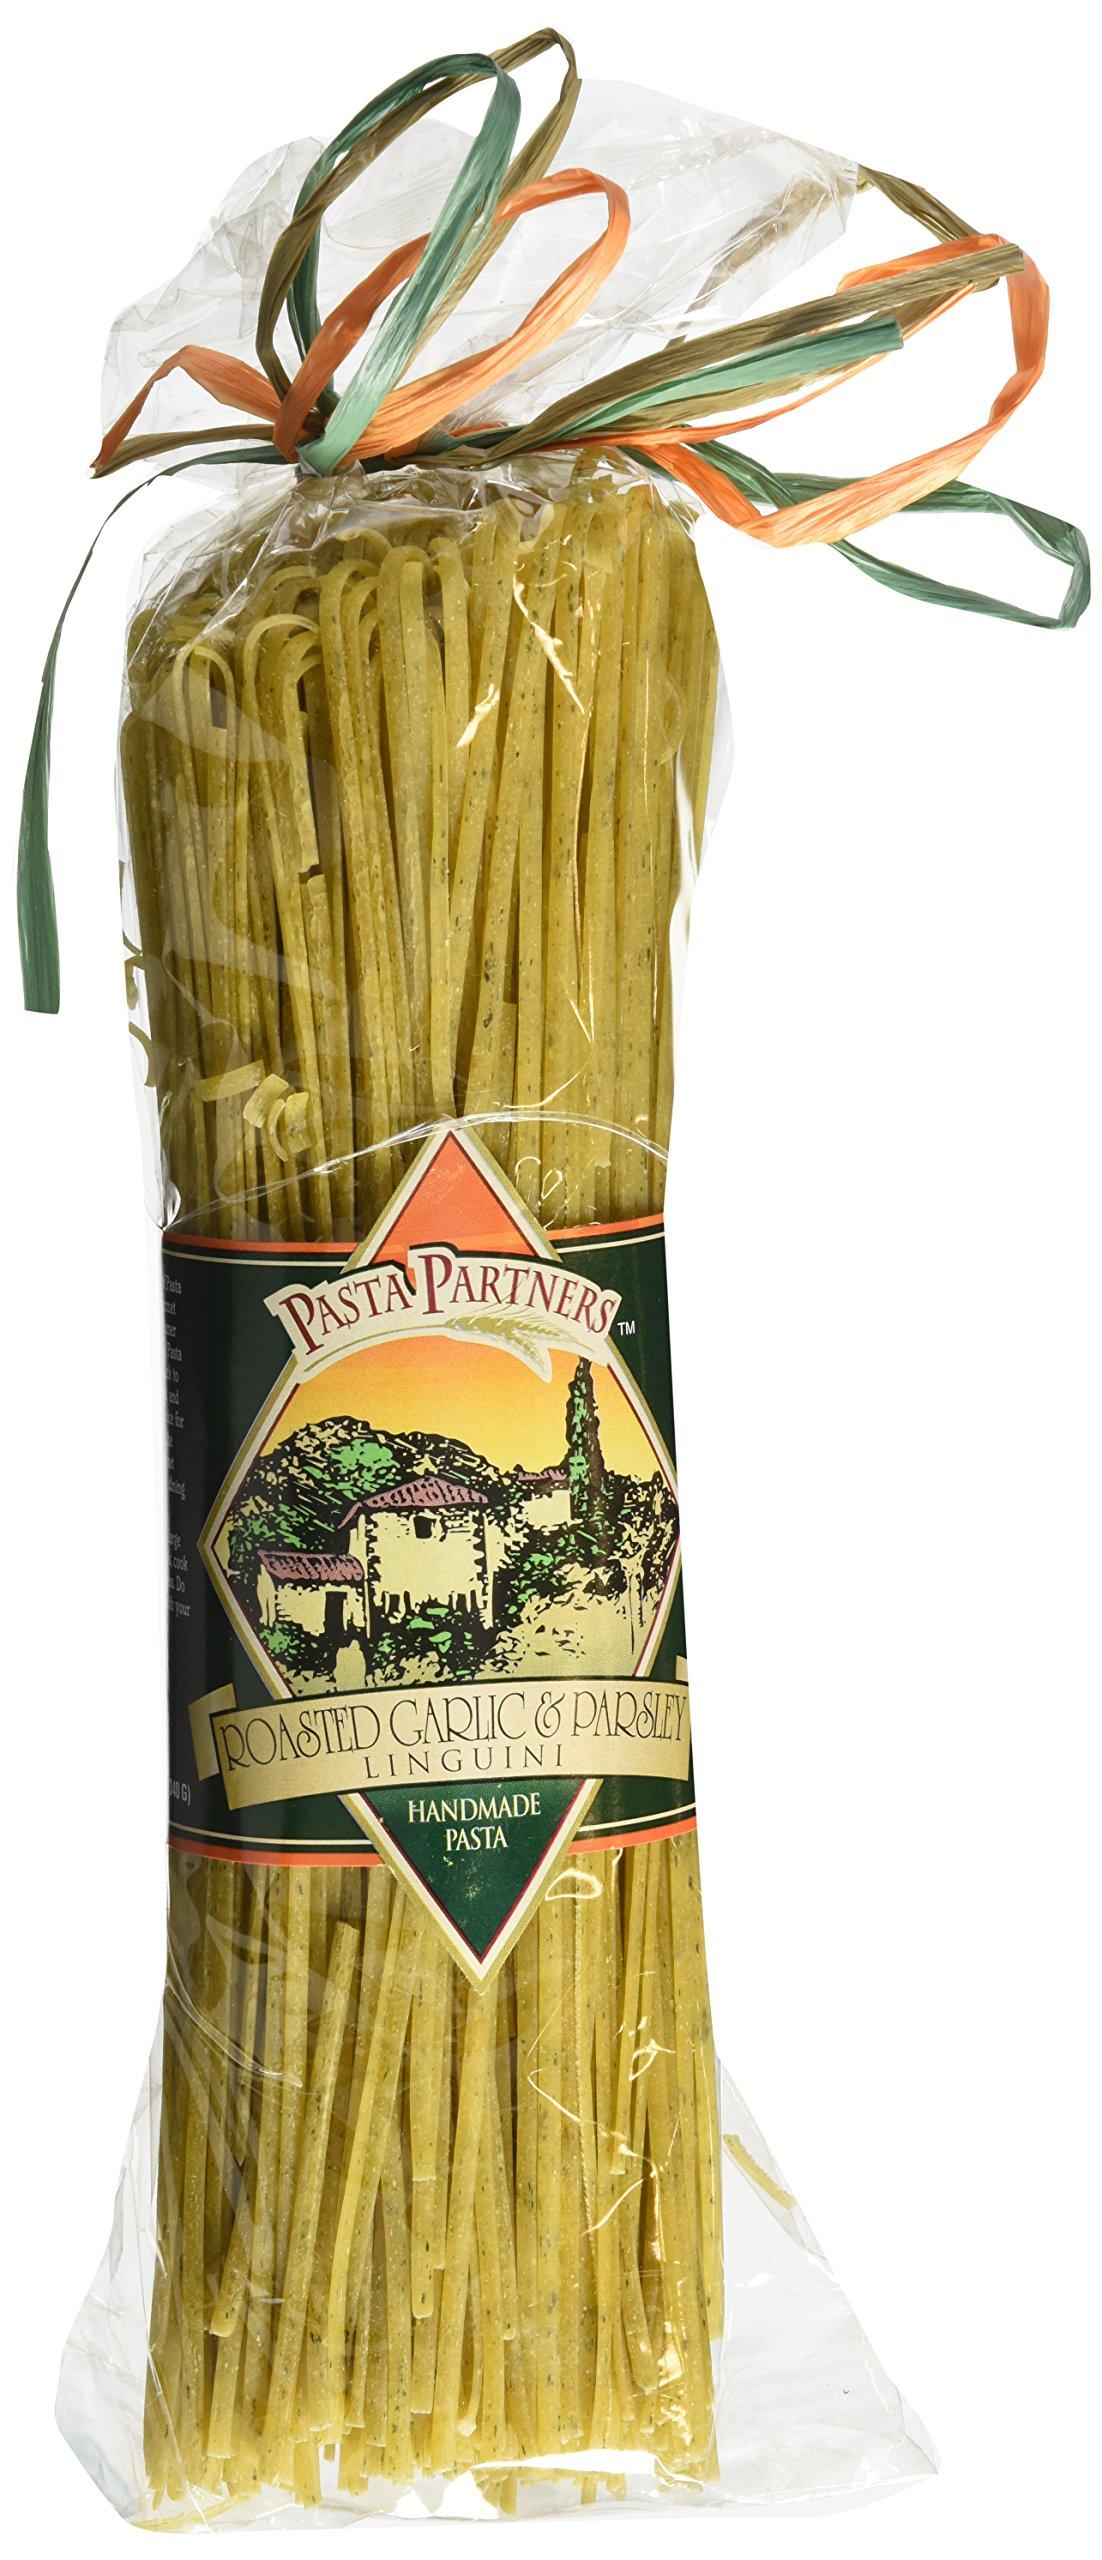 Pasta Partners Roasted Garlic Parsley Linguini (No Oil), 12 Ounce